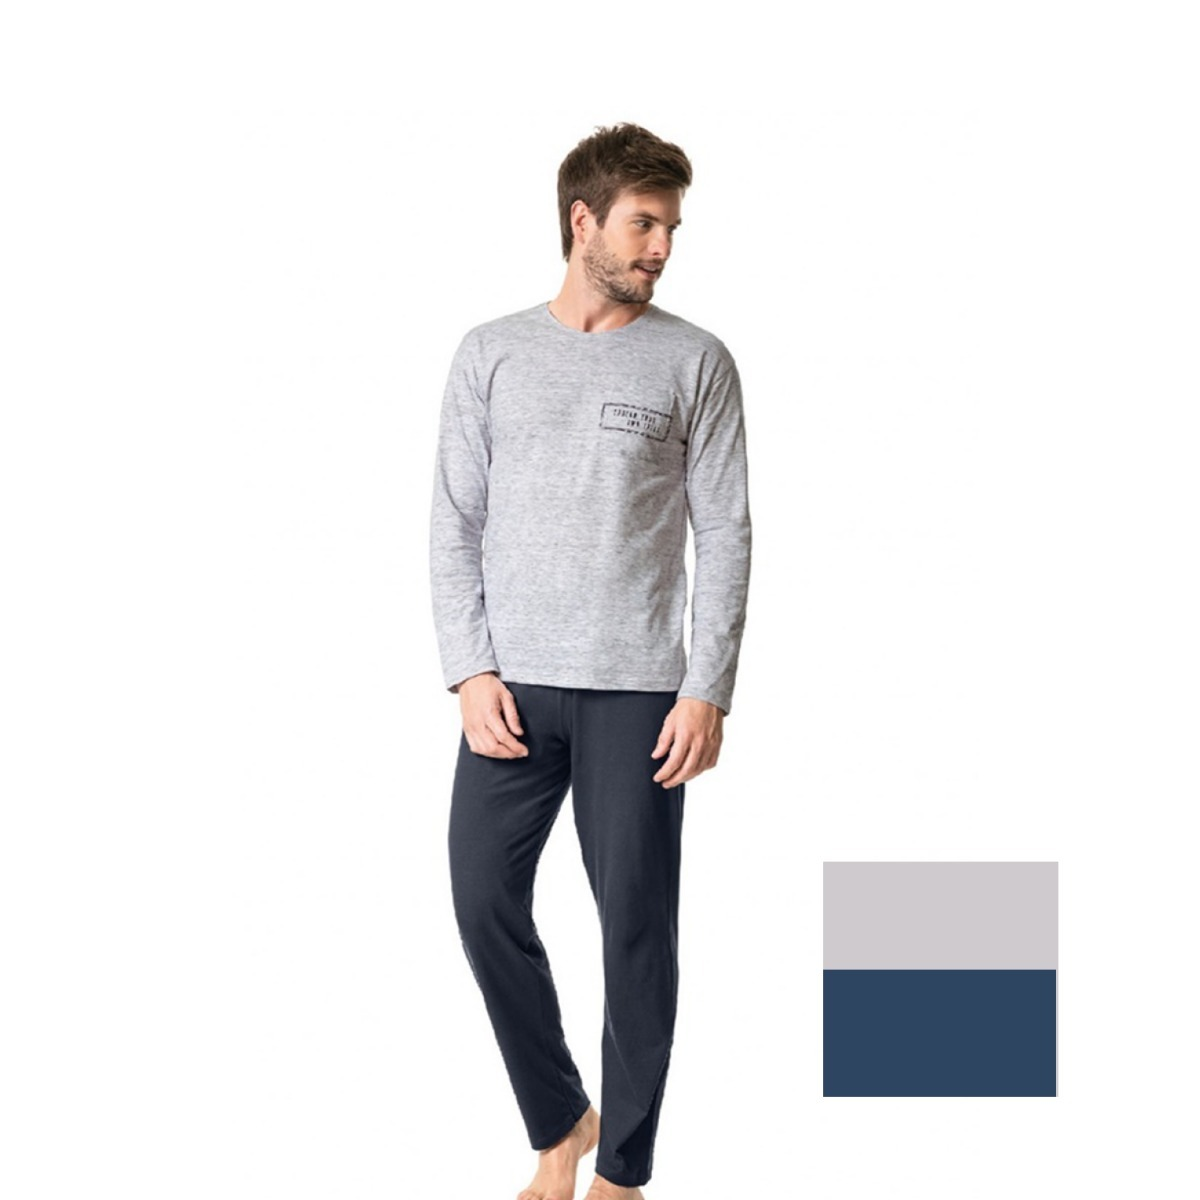 2e233f48f pijama masculino de inverno - malwee - 37263. Carregando zoom.